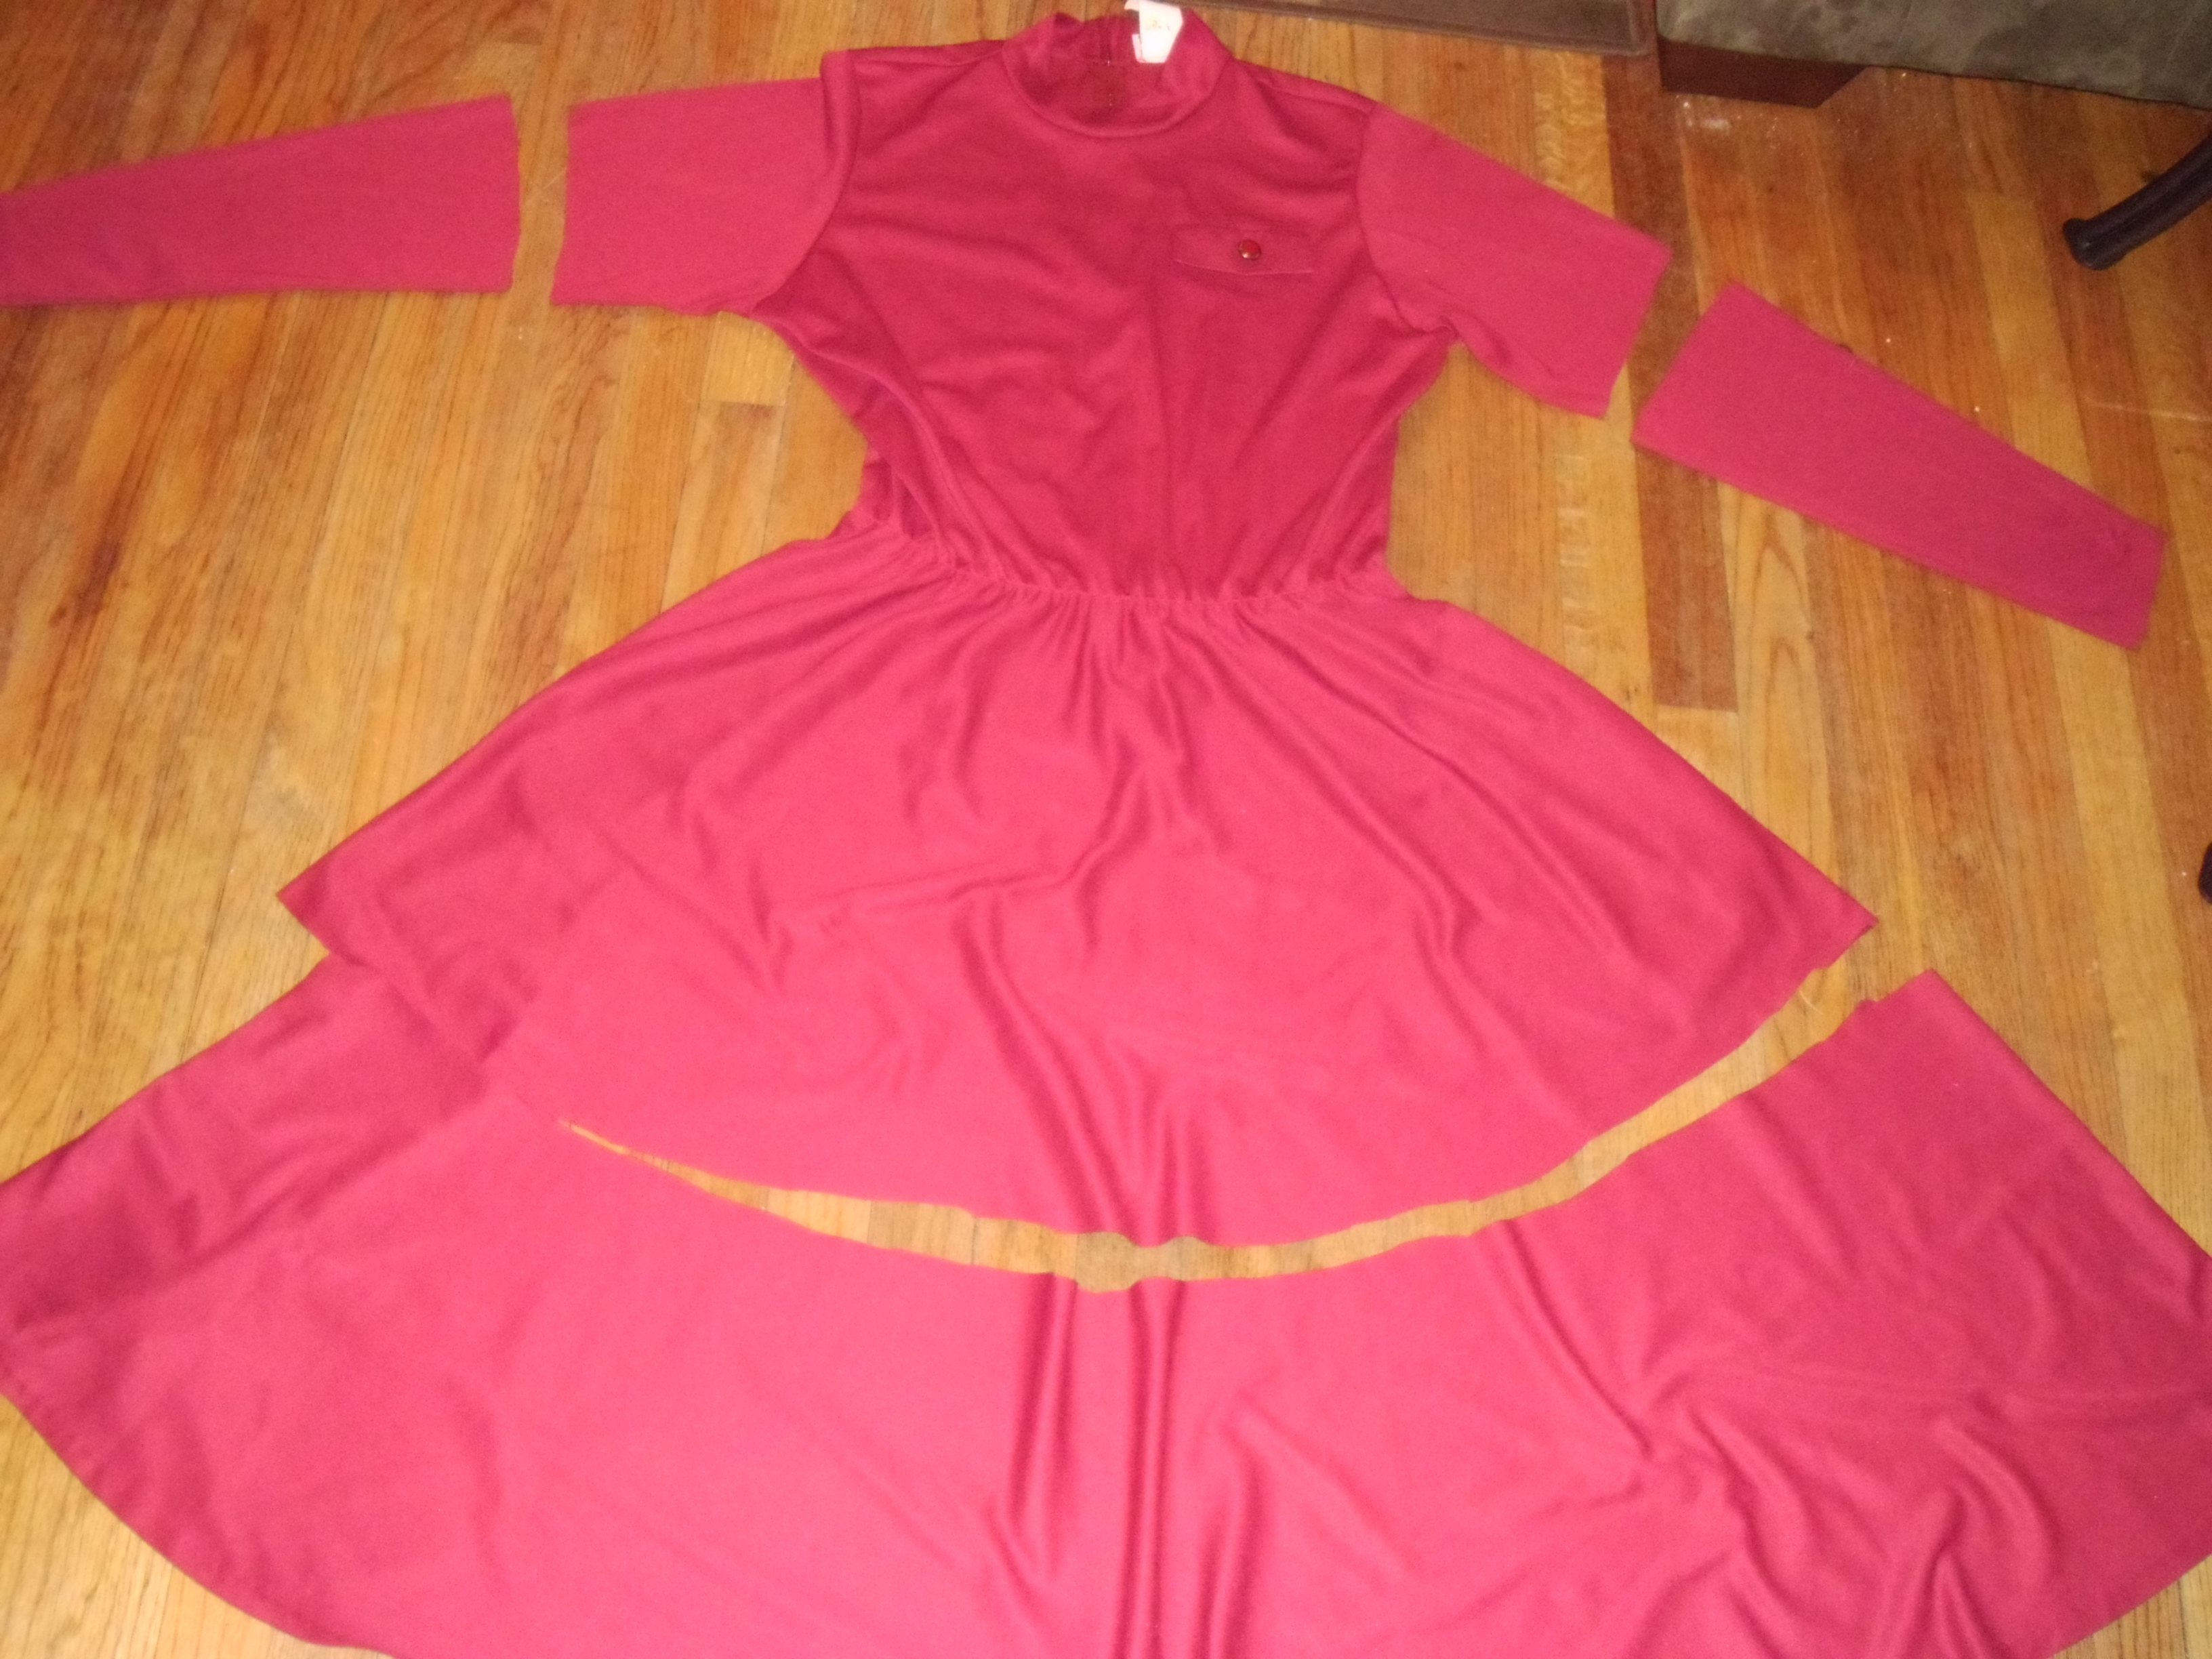 Day 177: Cranberry Sauce Dress 17